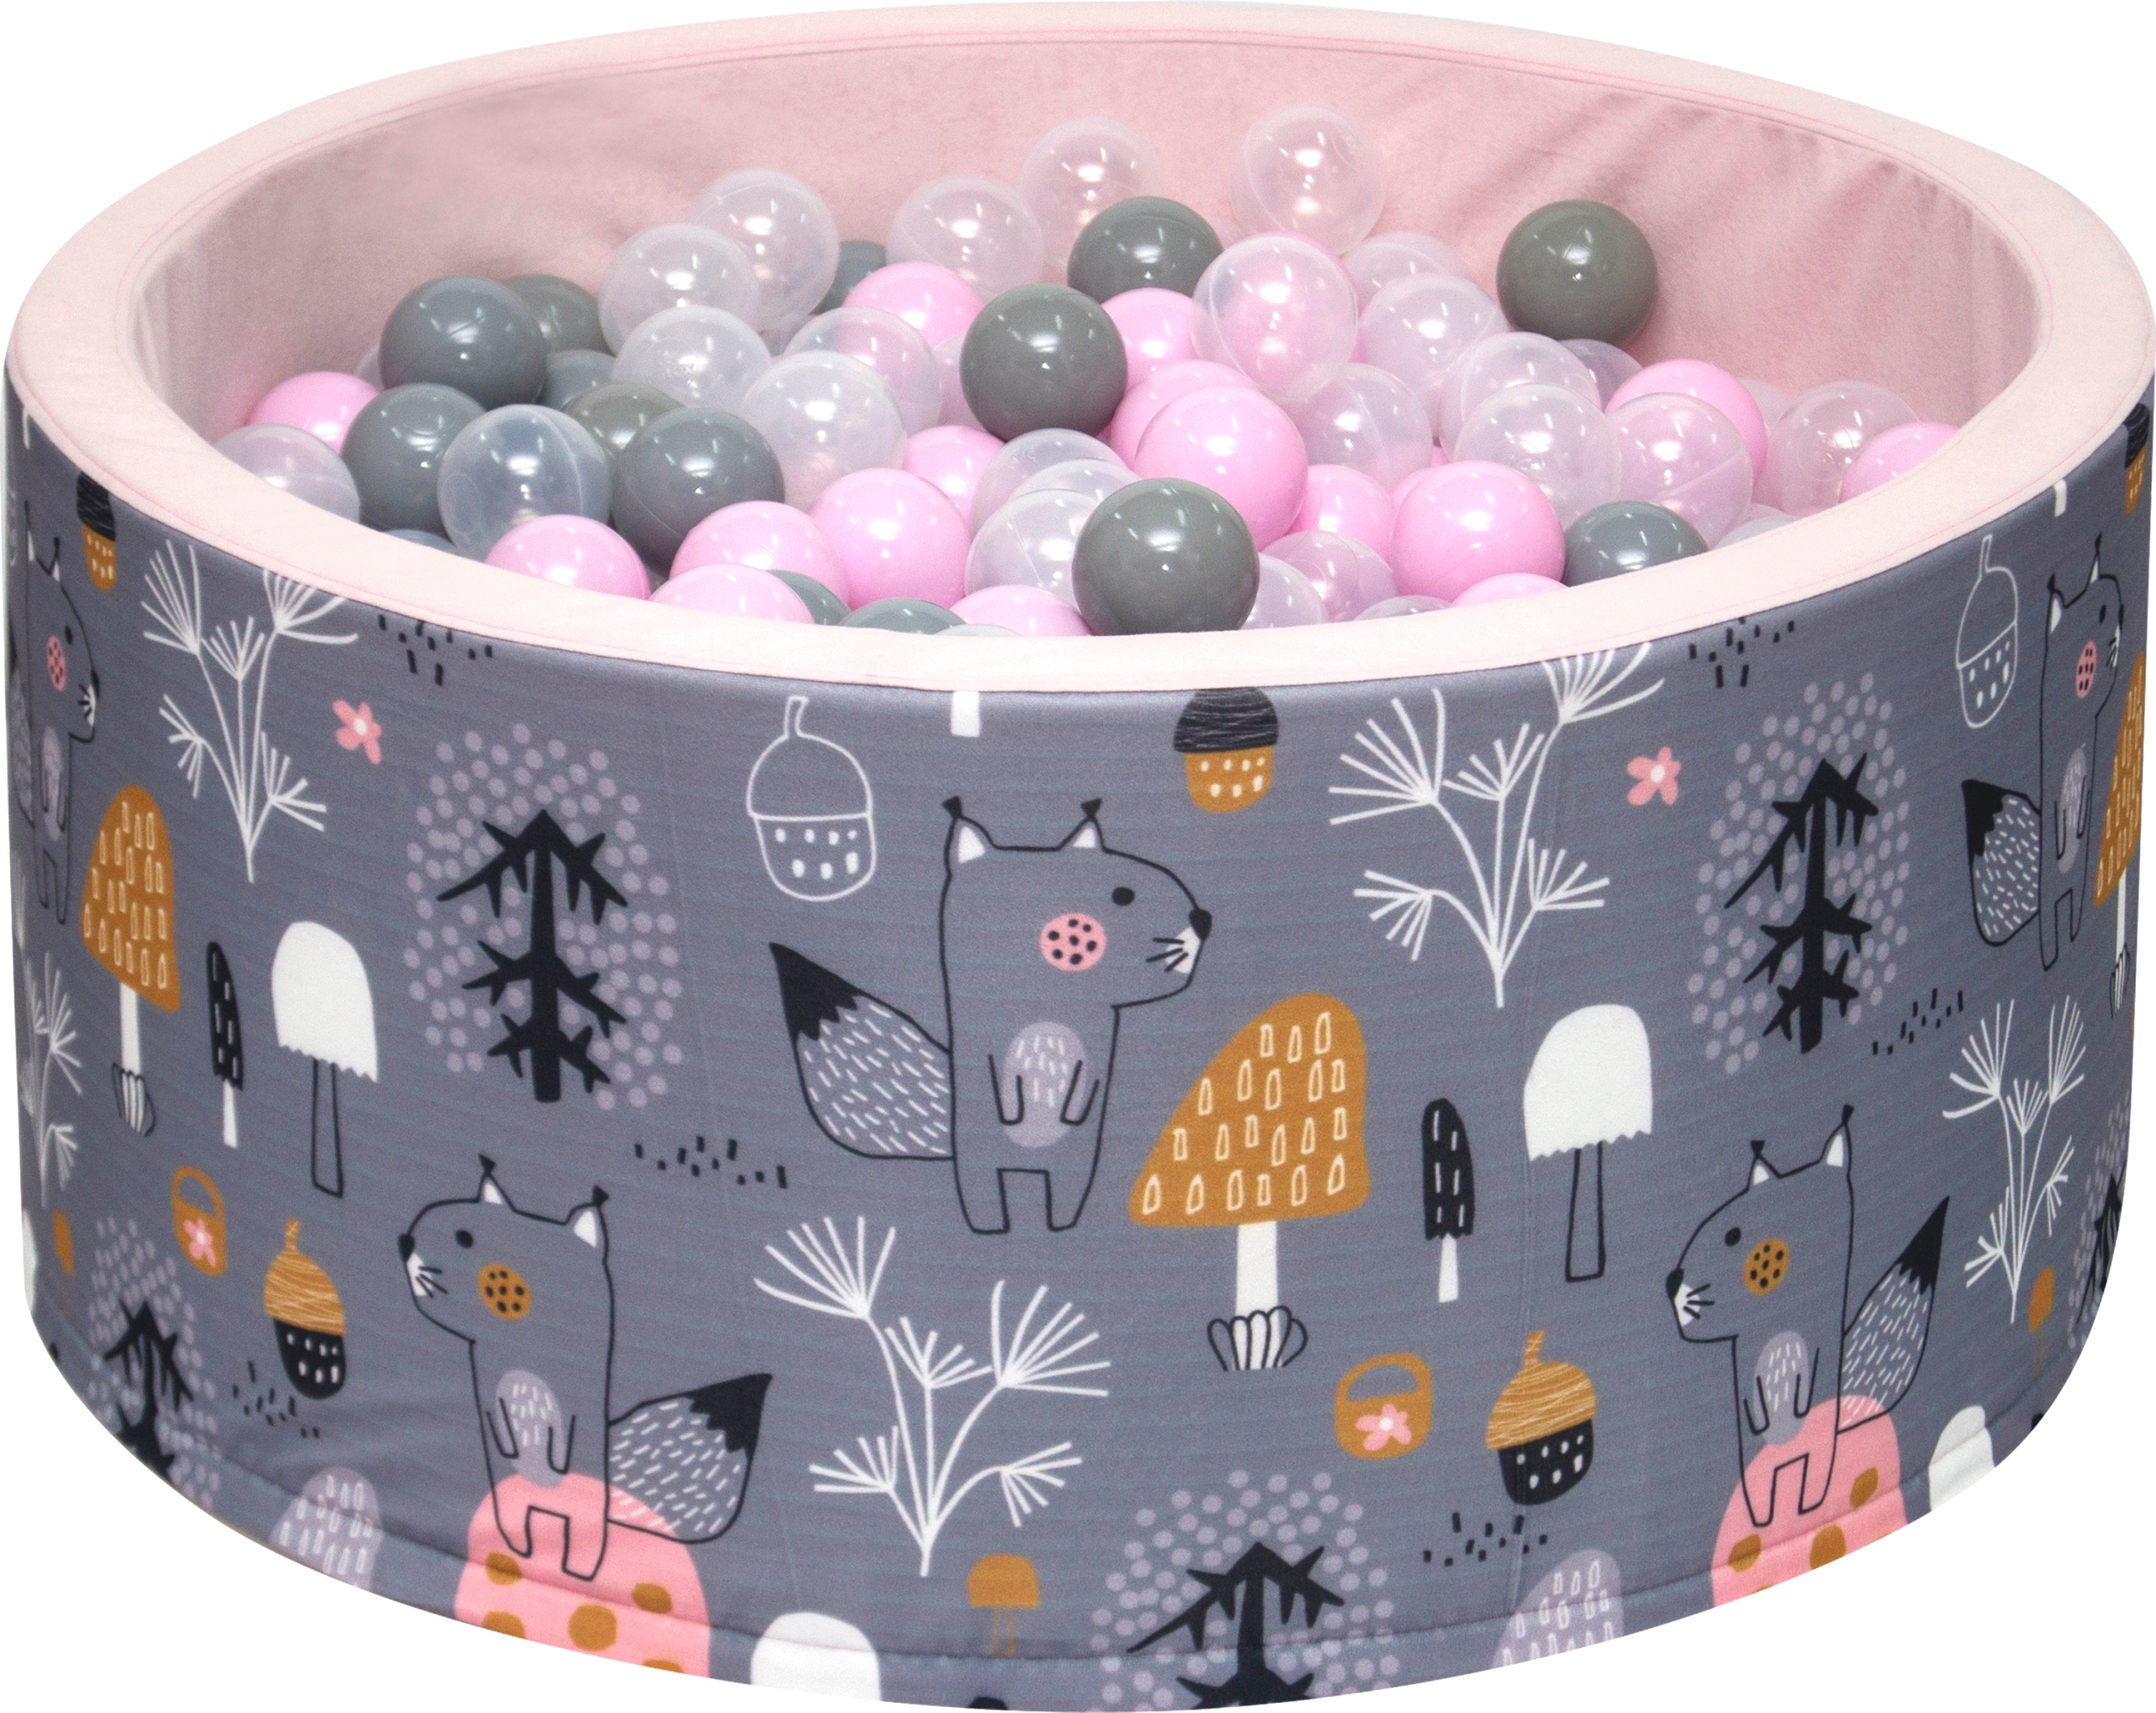 400 шаров + Dry Pool 90x40 с шарами, шары